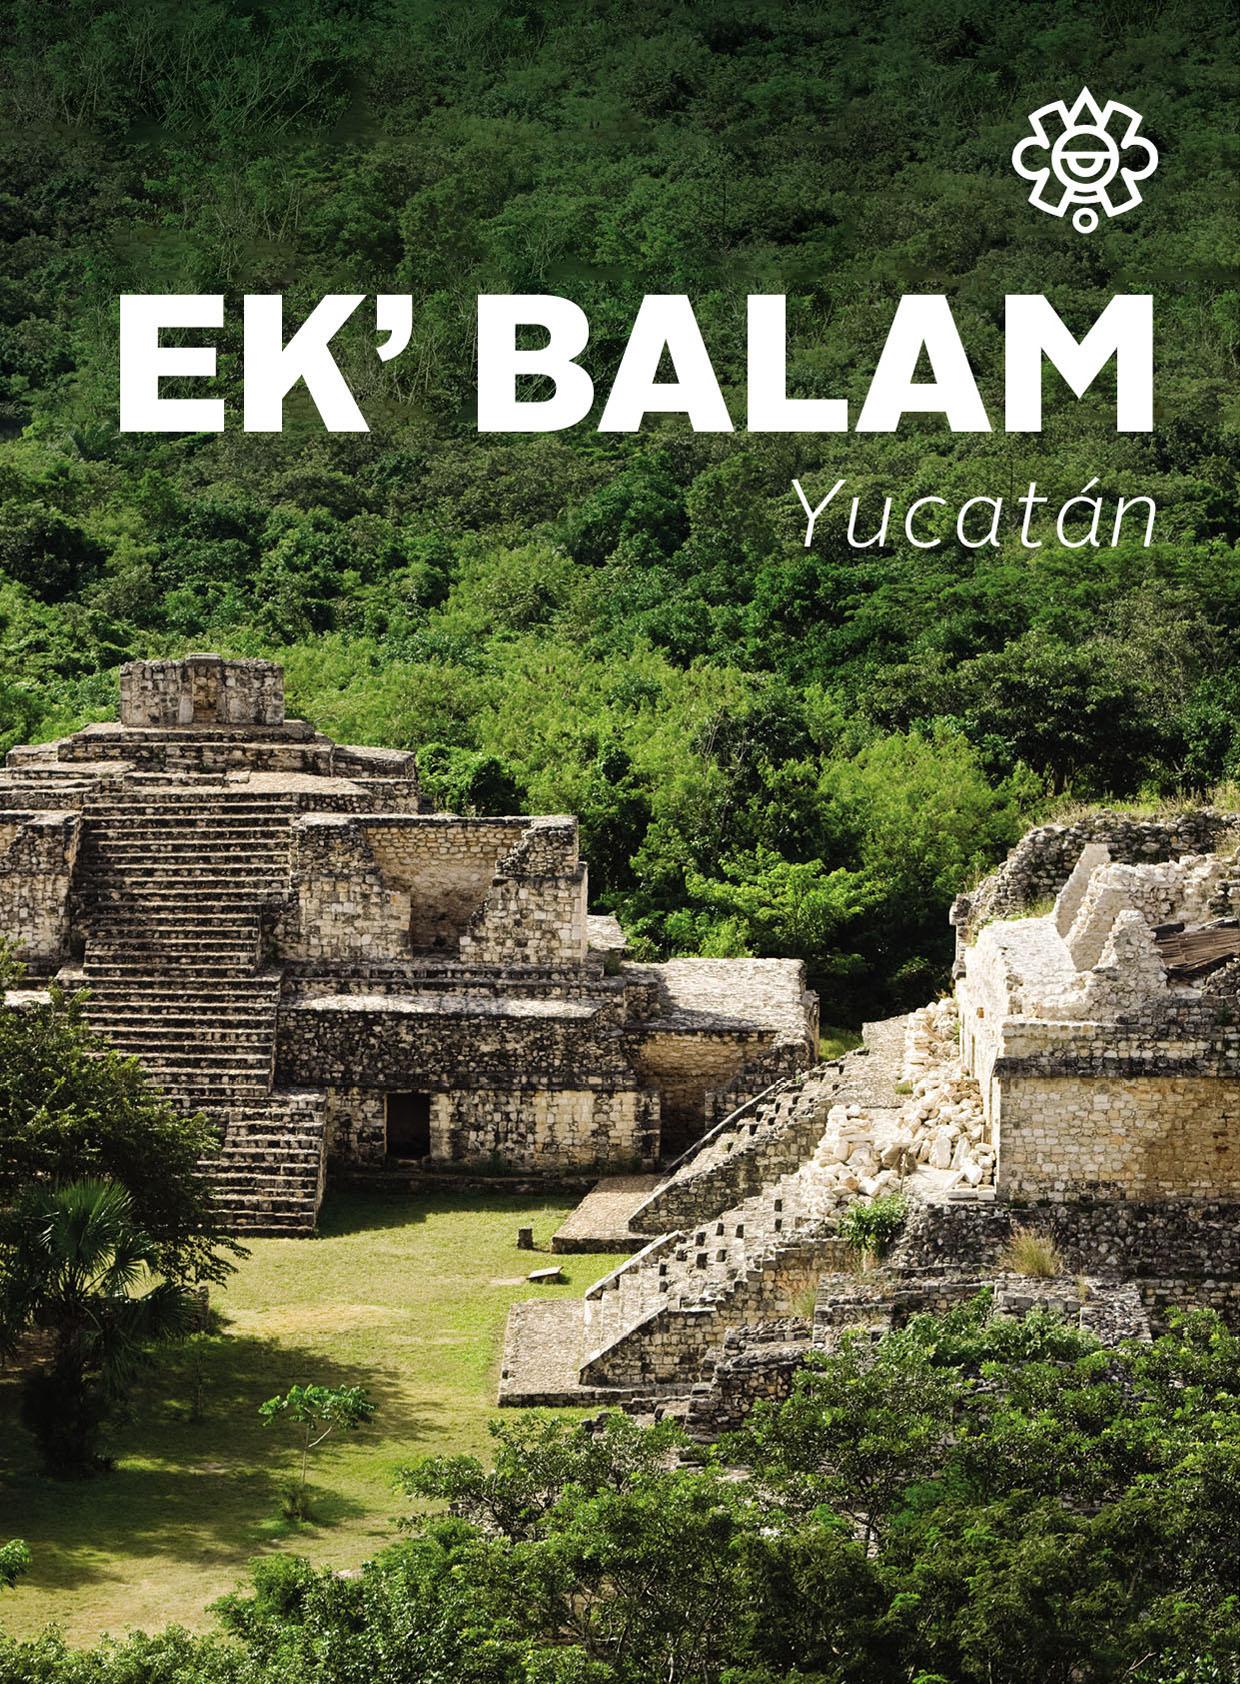 Ek Balam